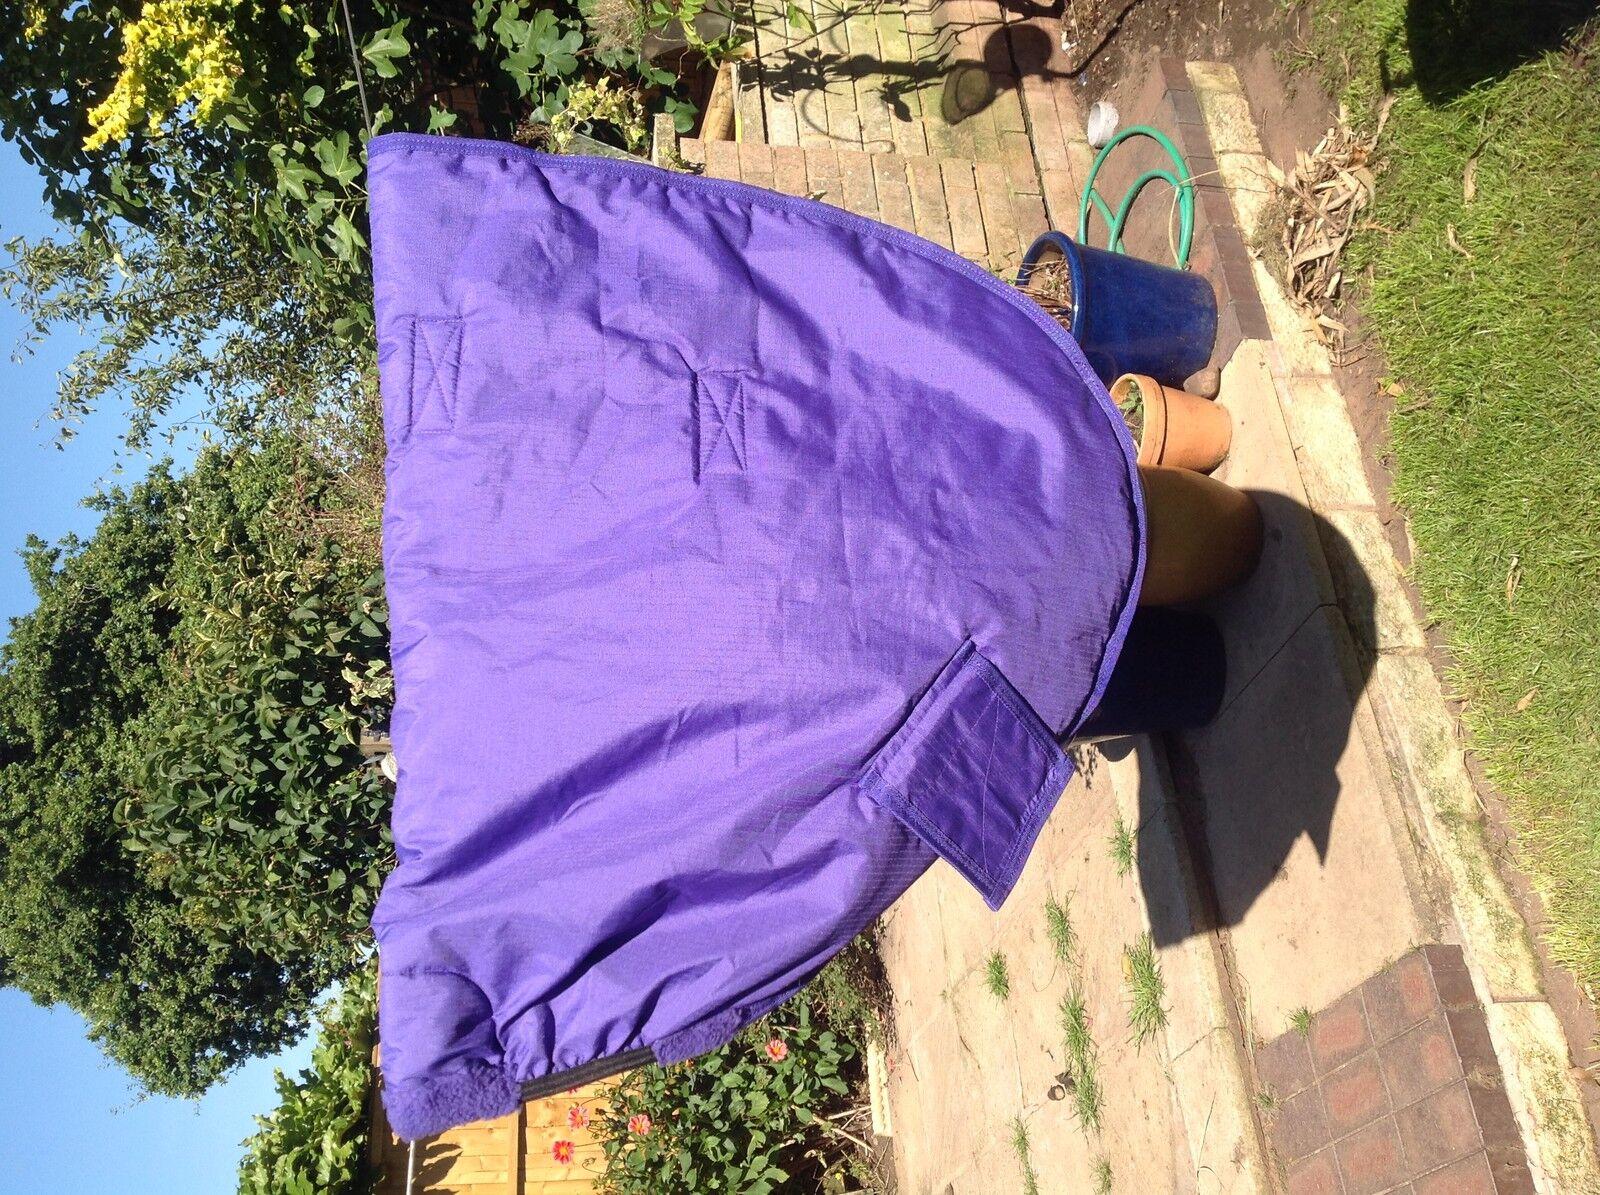 Kadence equiwear turnout hood - large - purple